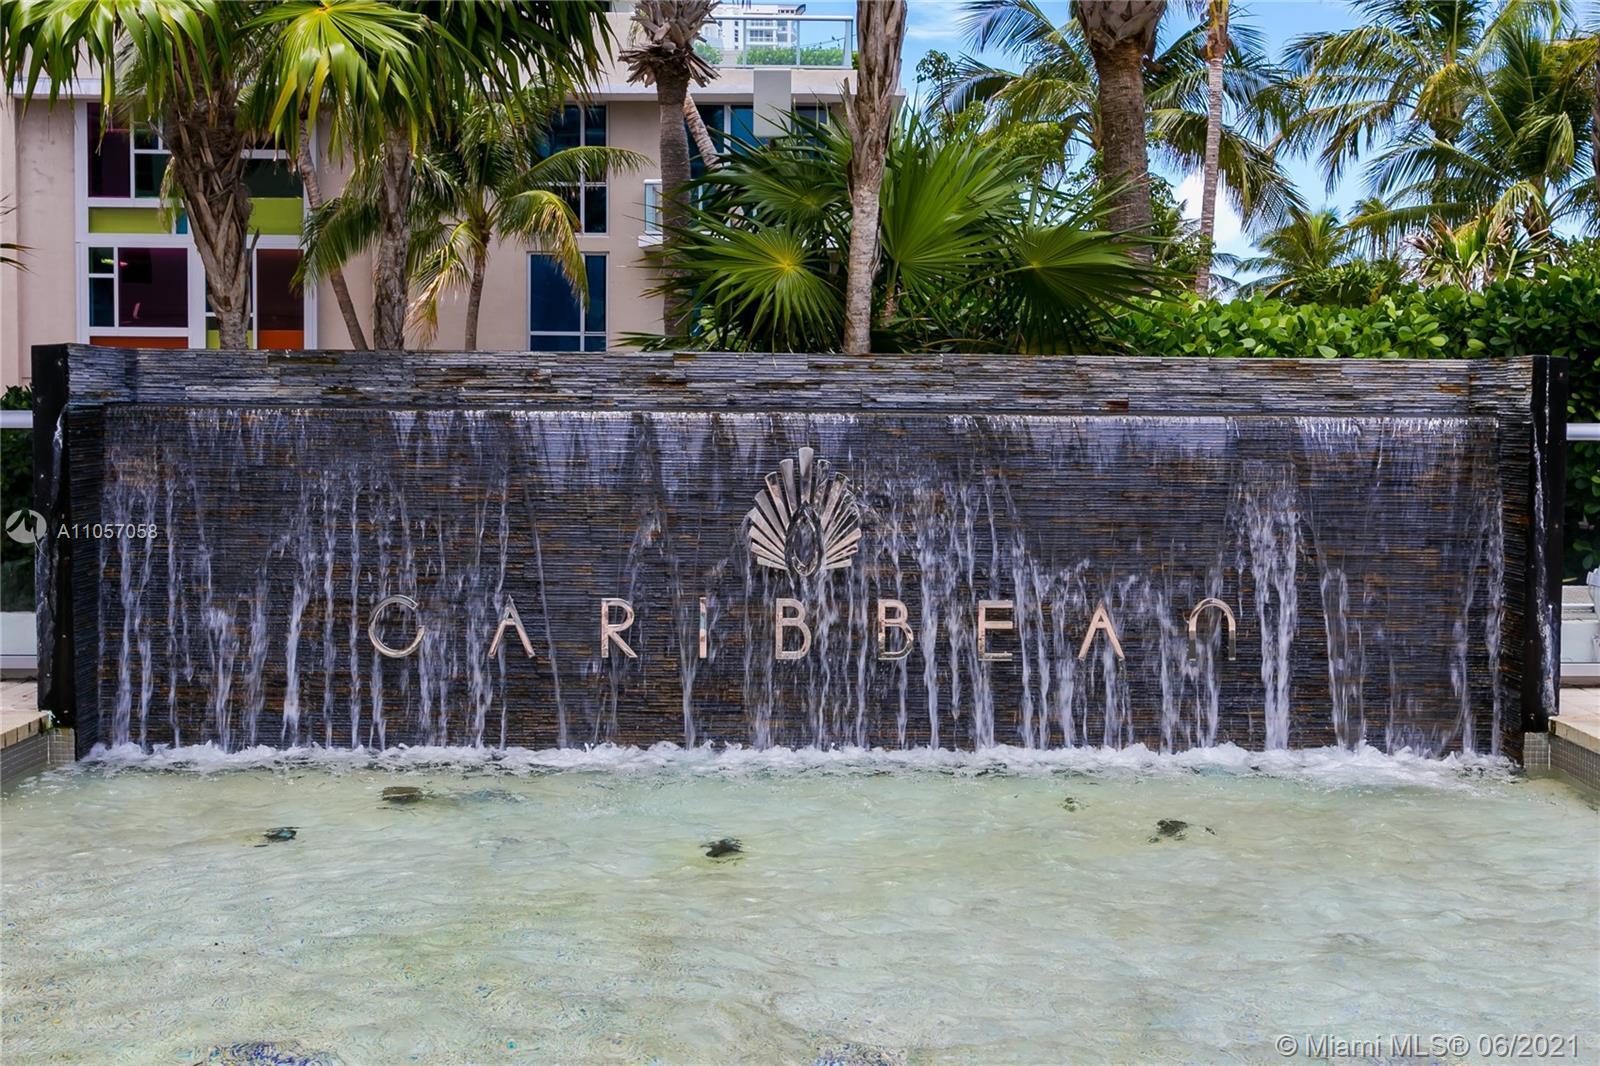 Caribbean - Condos for sale